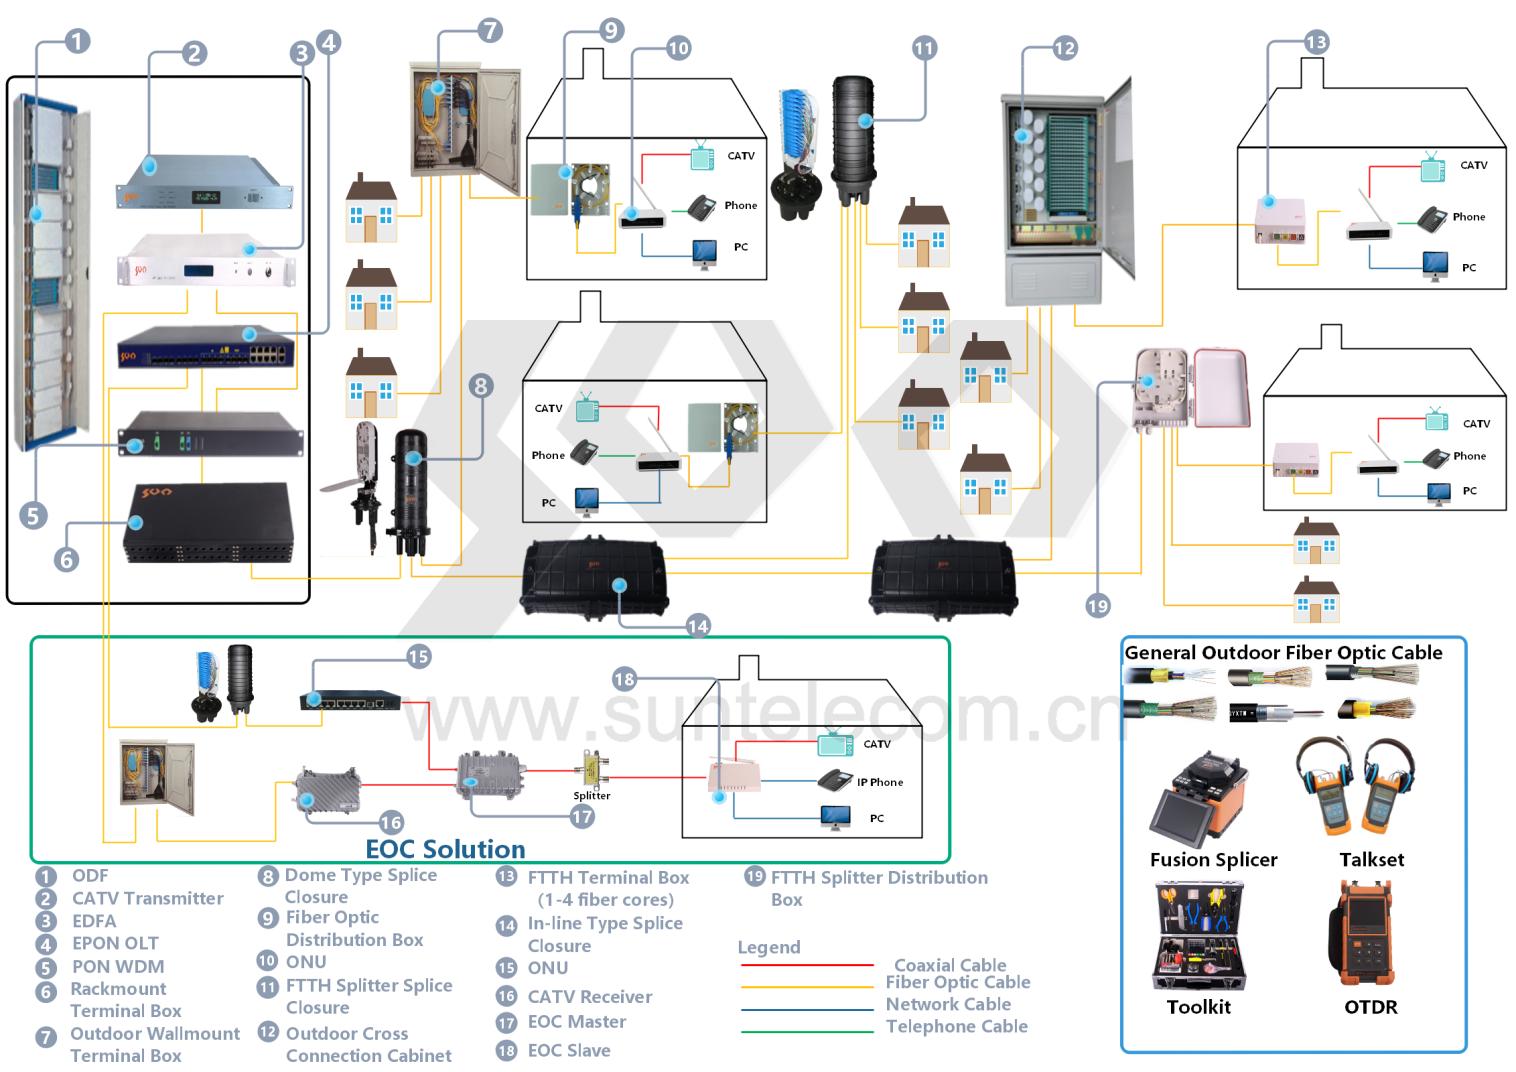 Fiber Optic Cabling Sun Telecom Fiber Optic Solutions Provider Fiber Optic Fiber Solutions